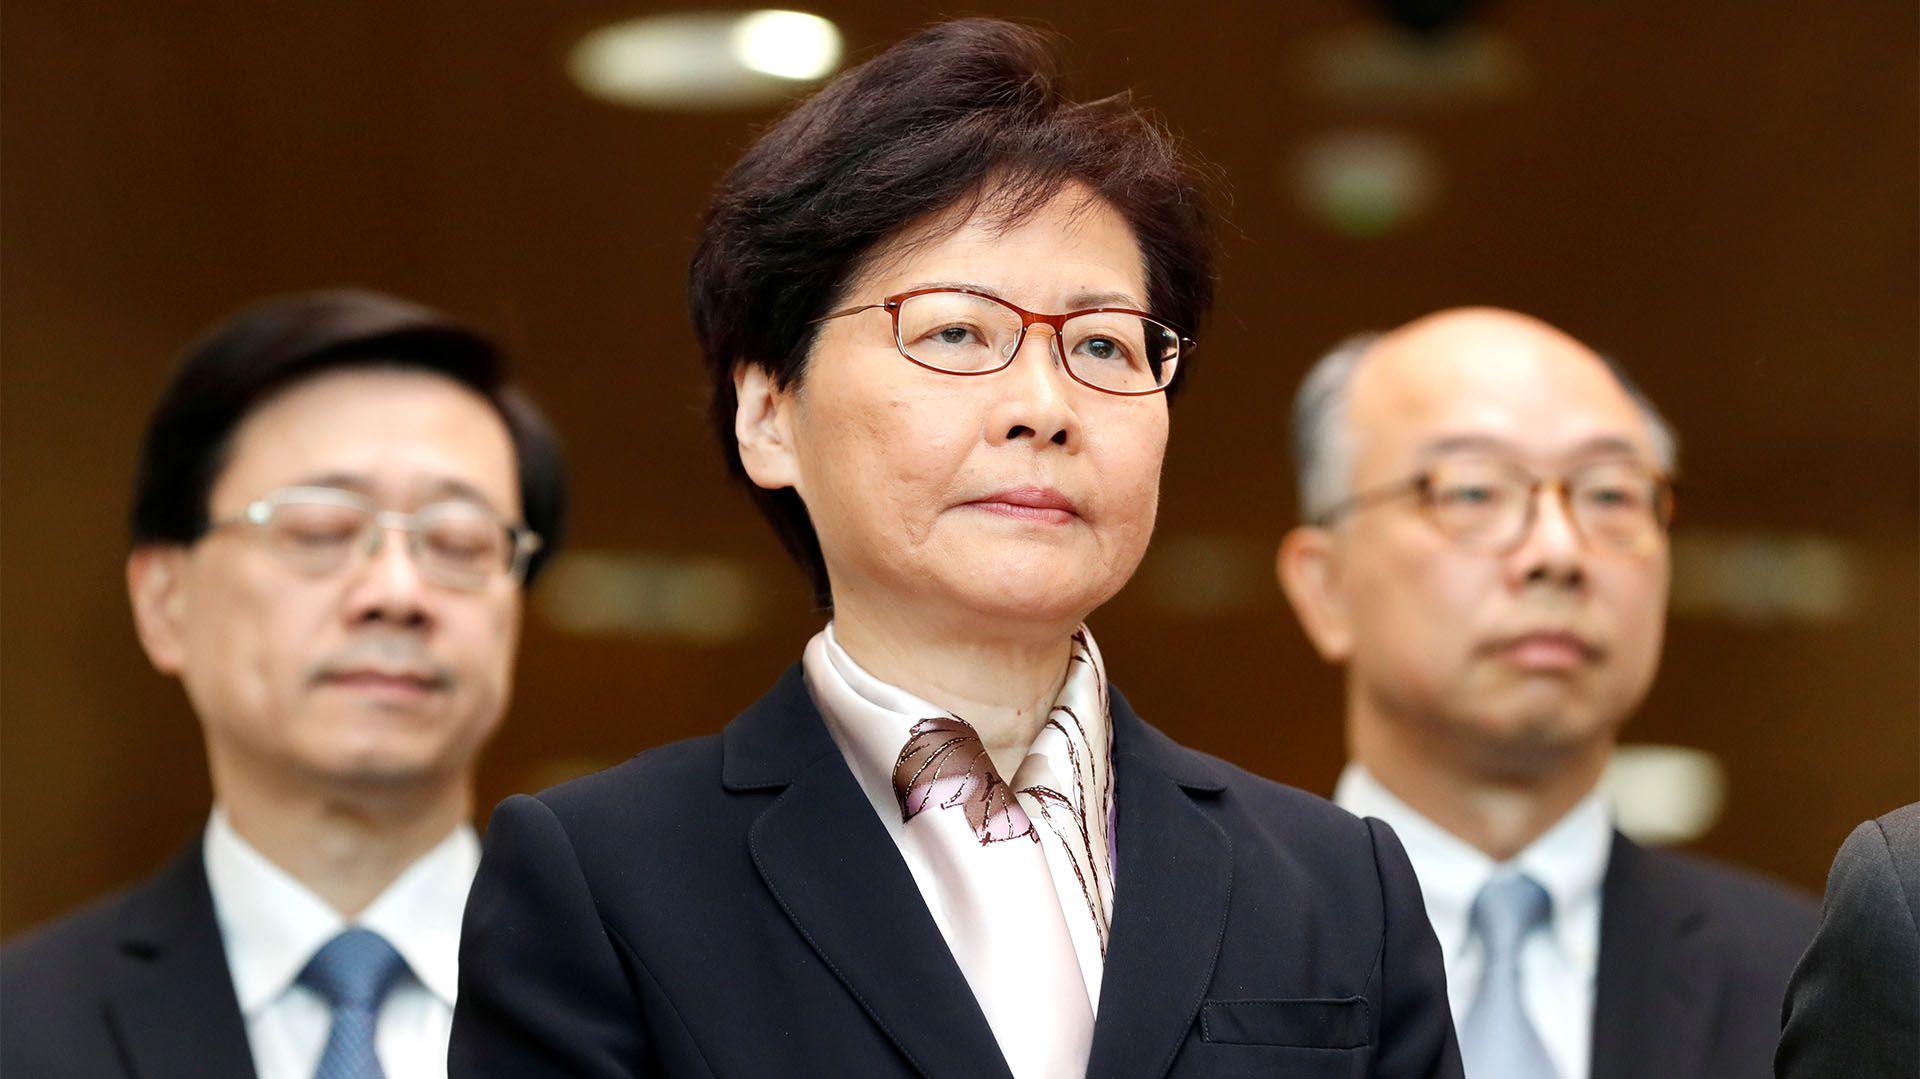 La jefa del Gobierno de Hong Kong, Carrie Lam. (REUTERS/Kim Kyung-Hoon)